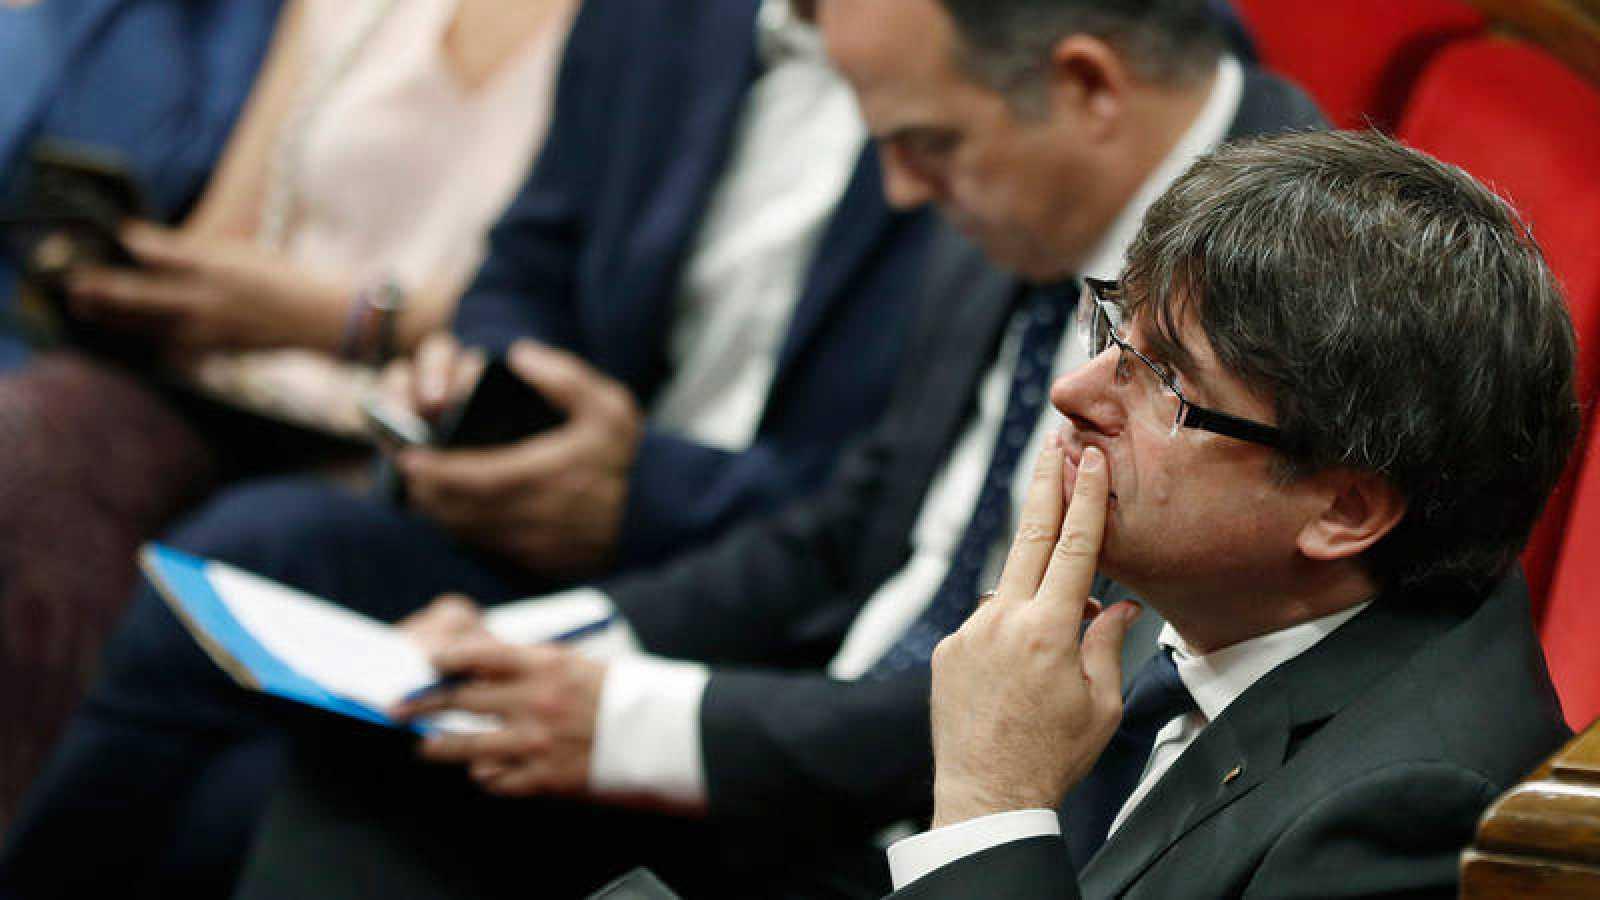 El presidente de la Generalitat, Carles Puigemont, en un pleno del Parlament